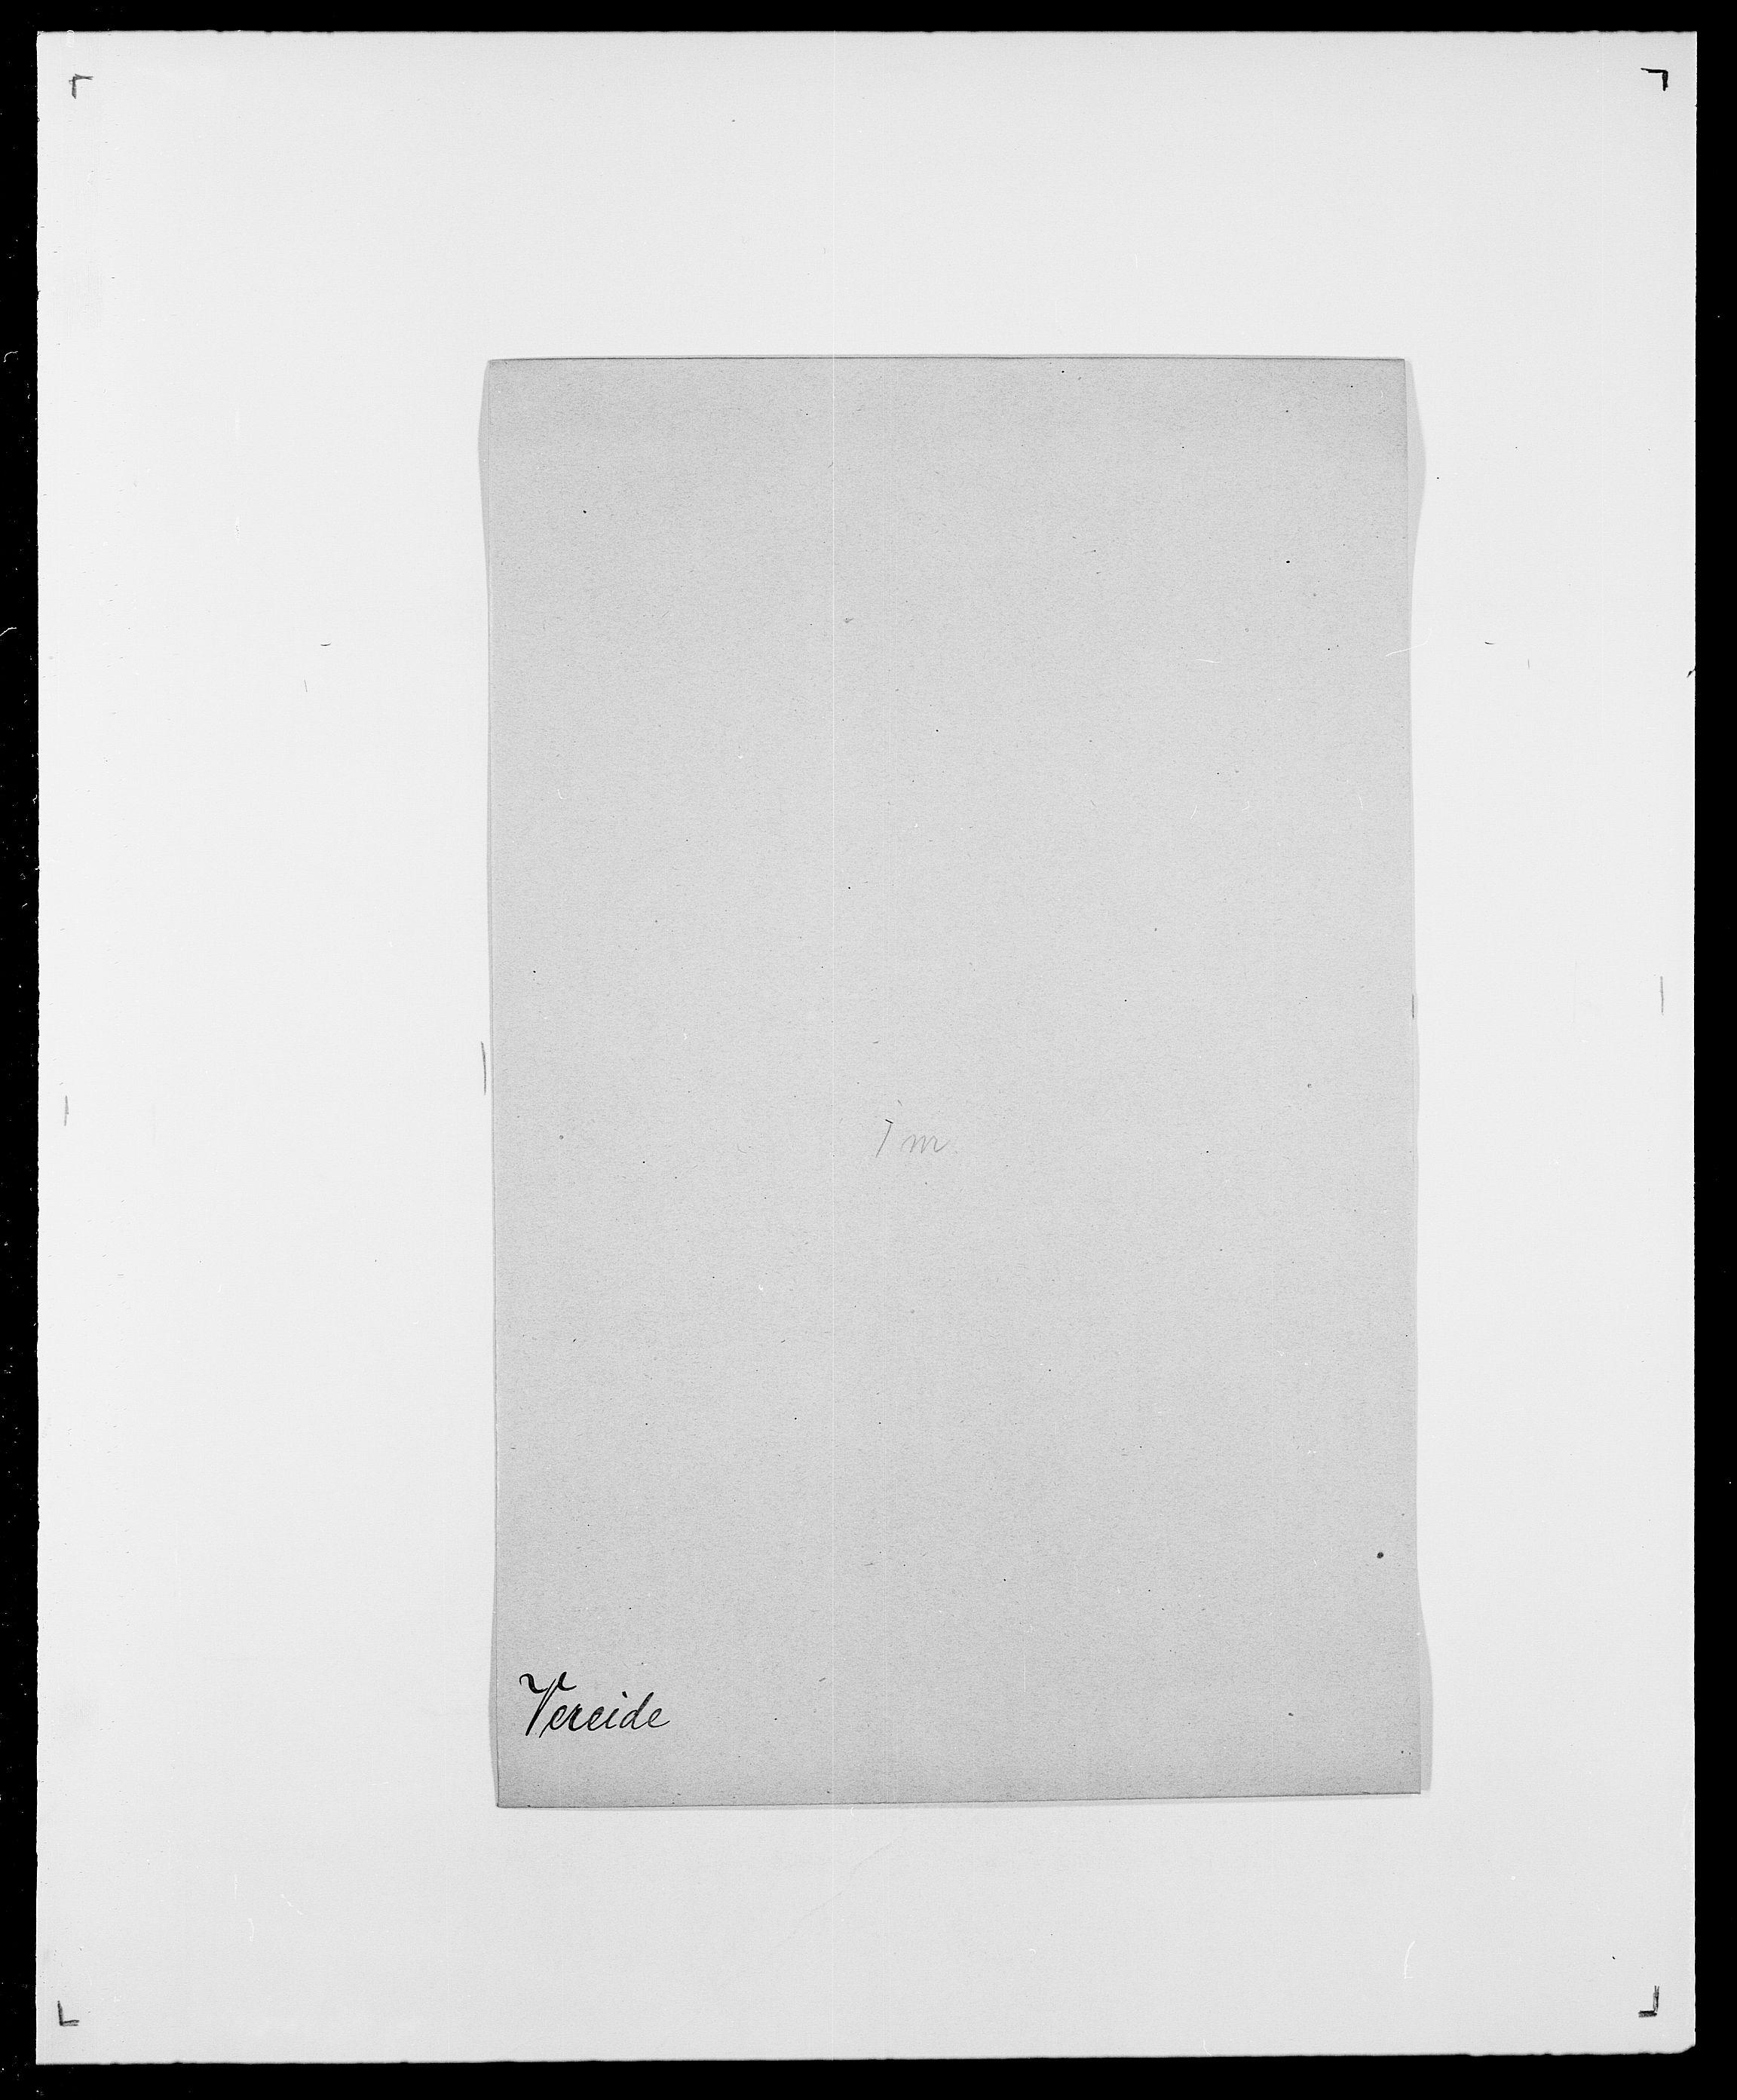 SAO, Delgobe, Charles Antoine - samling, D/Da/L0041: Vemmestad - Viker, s. 69